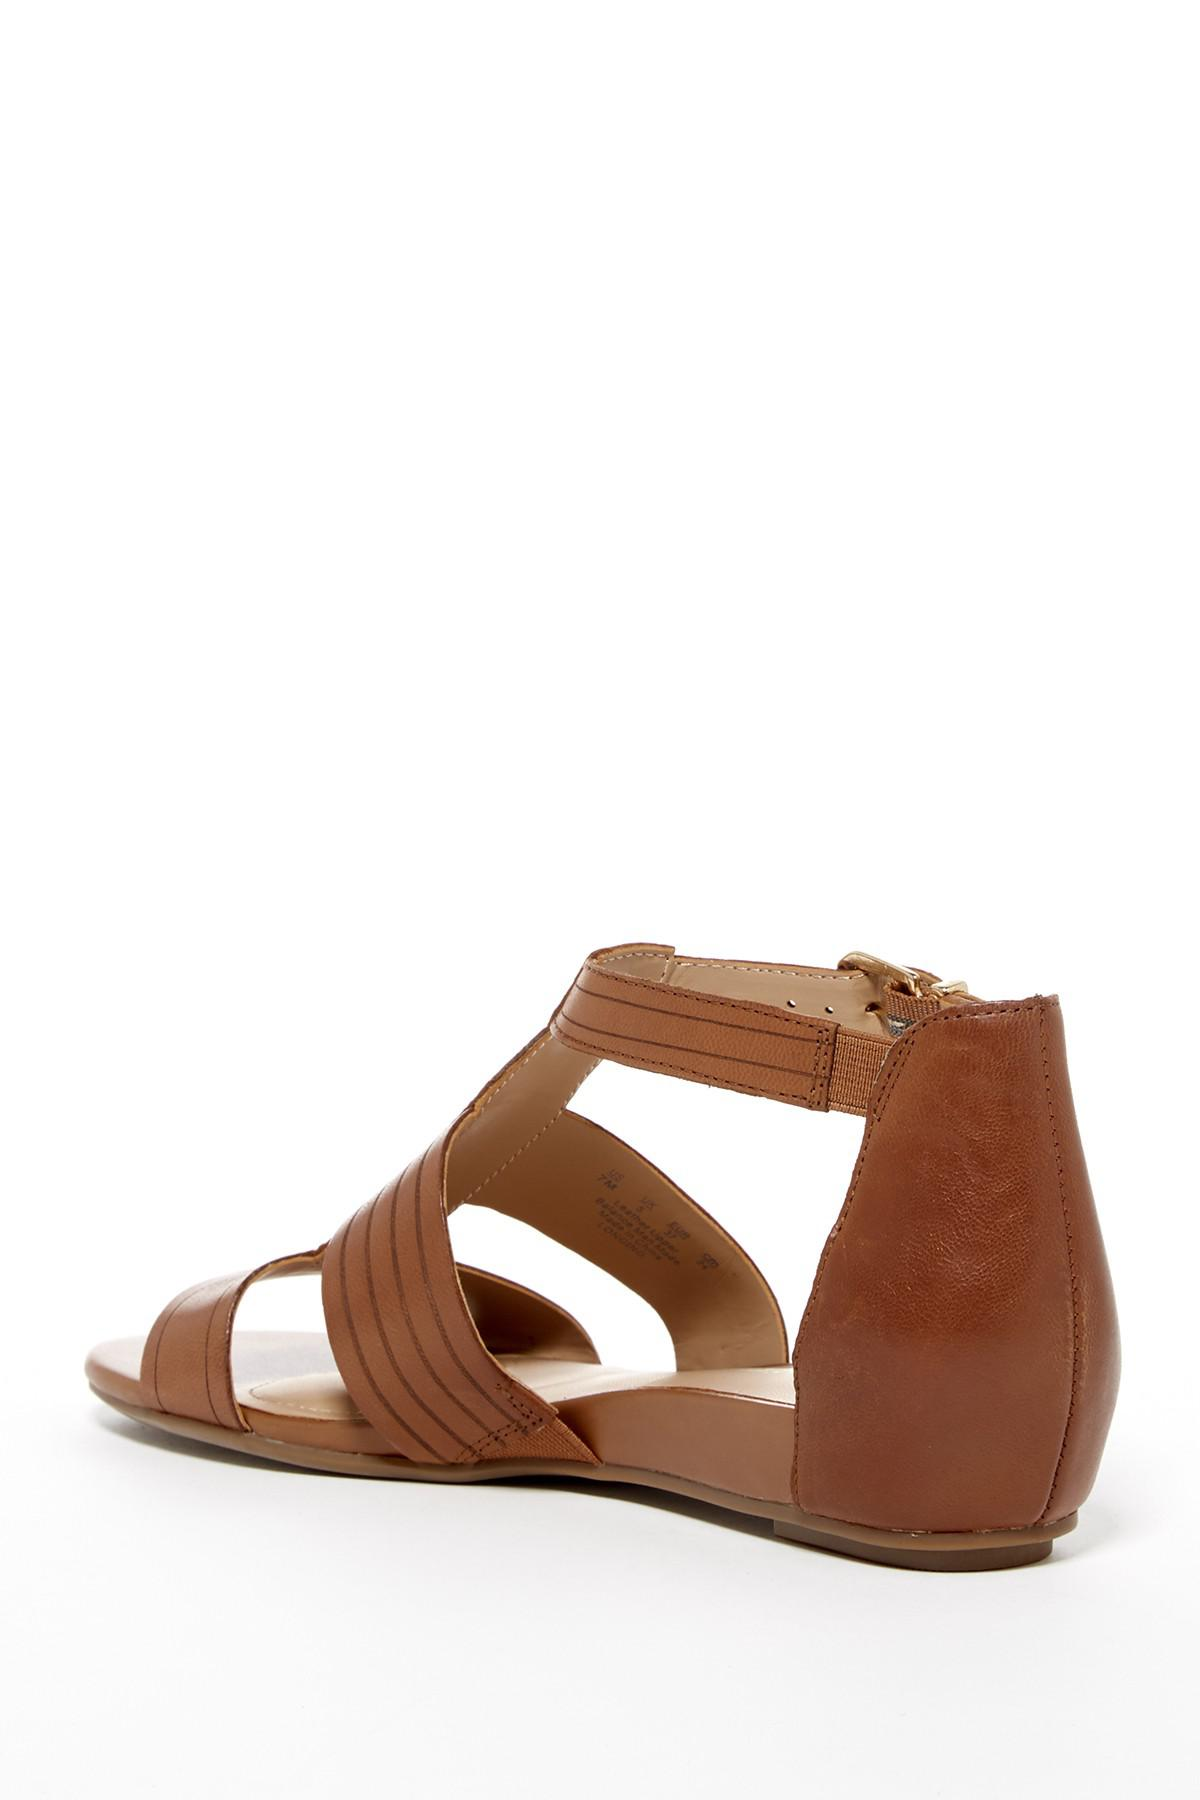 58a4fa4d0dc5 Lyst - Naturalizer Longing Flat Sandal in Brown